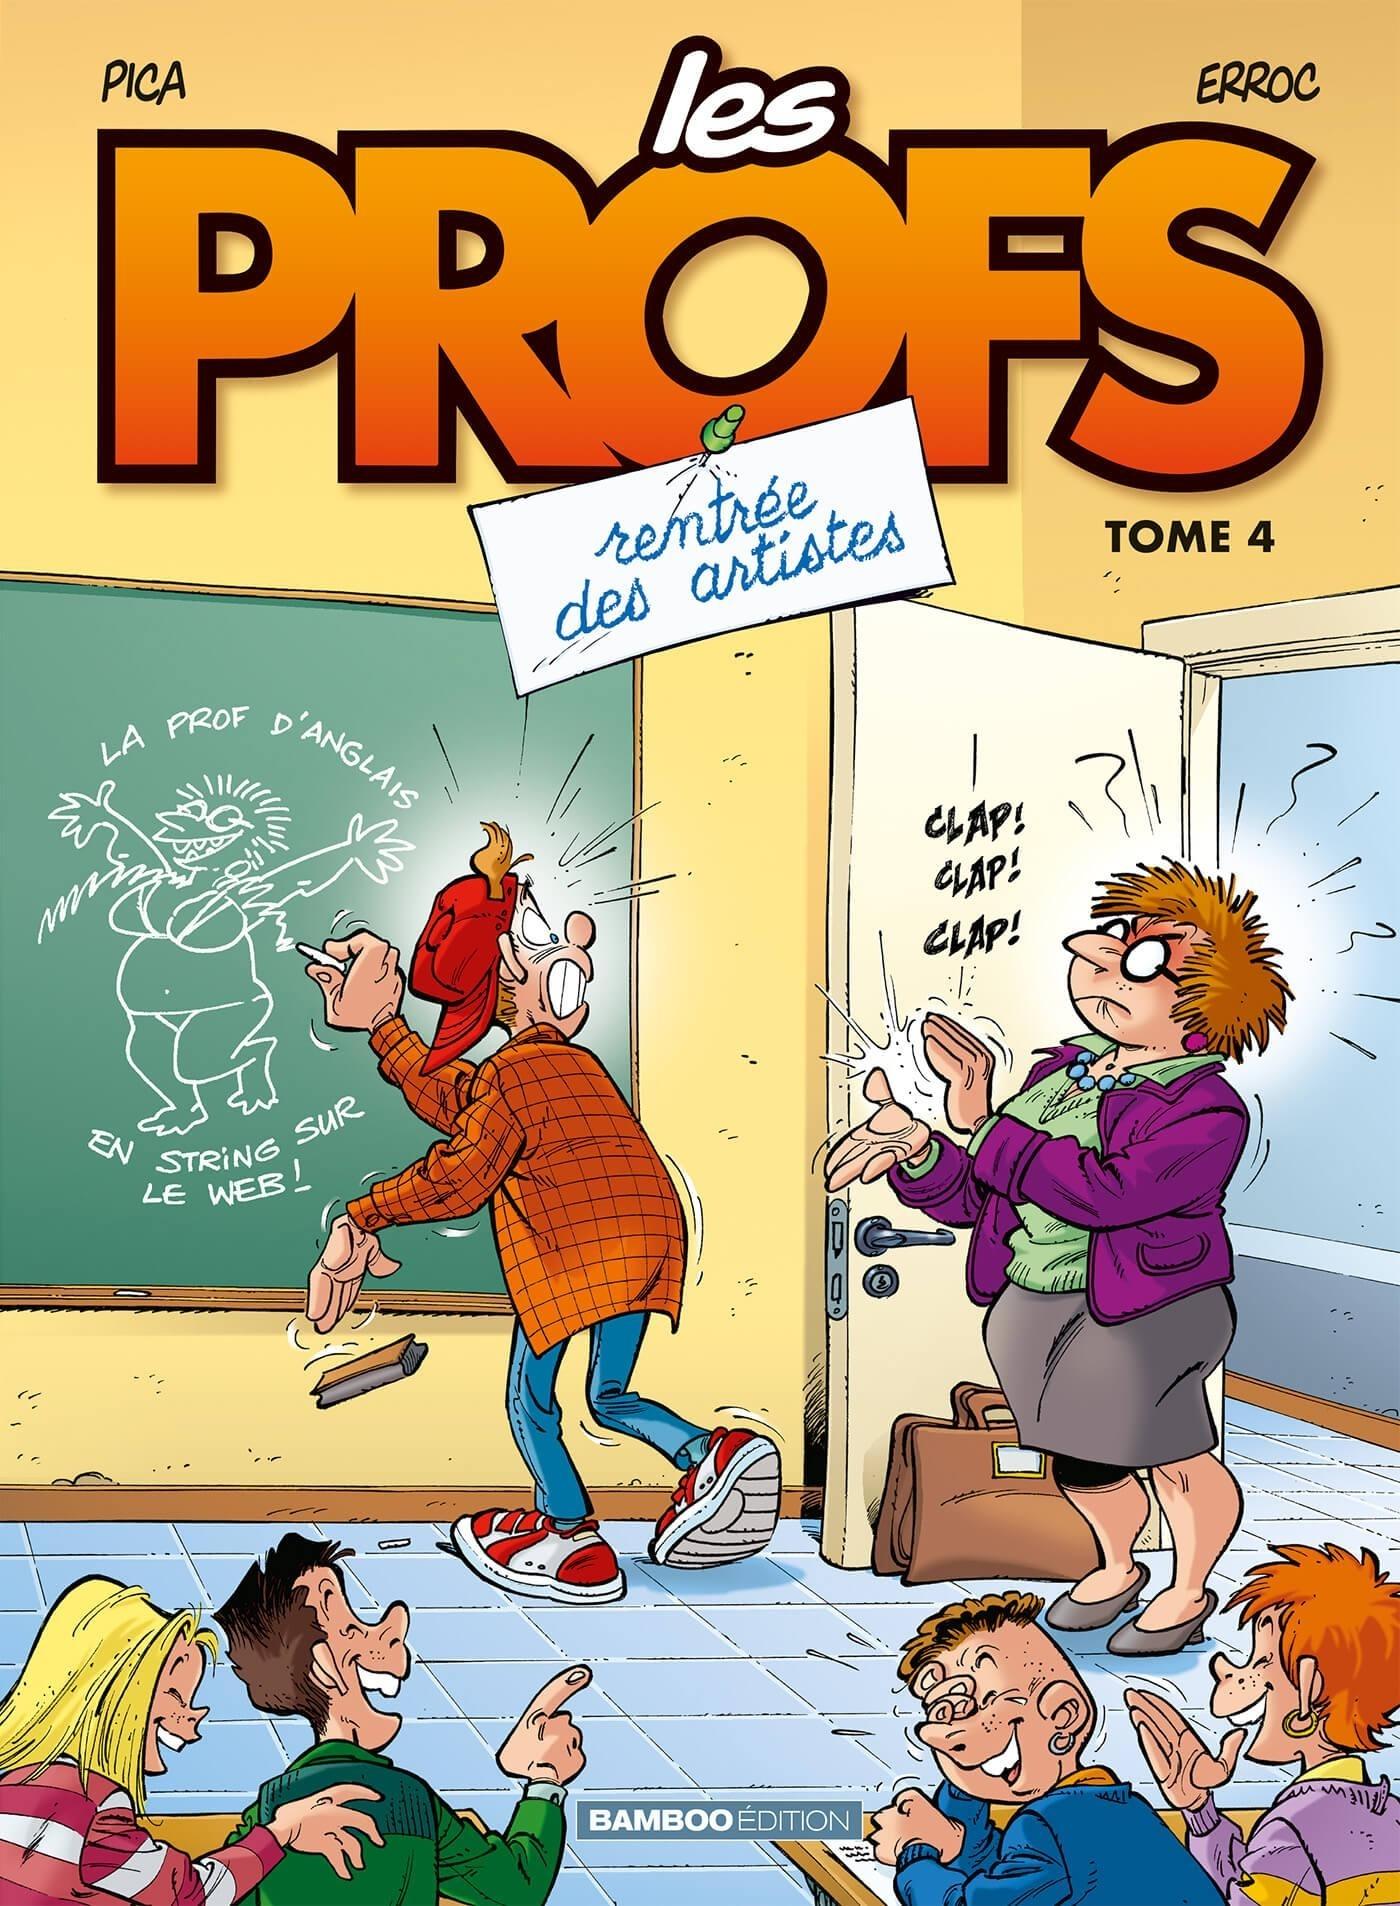 LES PROFS - TOME 4 - RENTREE DES ARTISTES